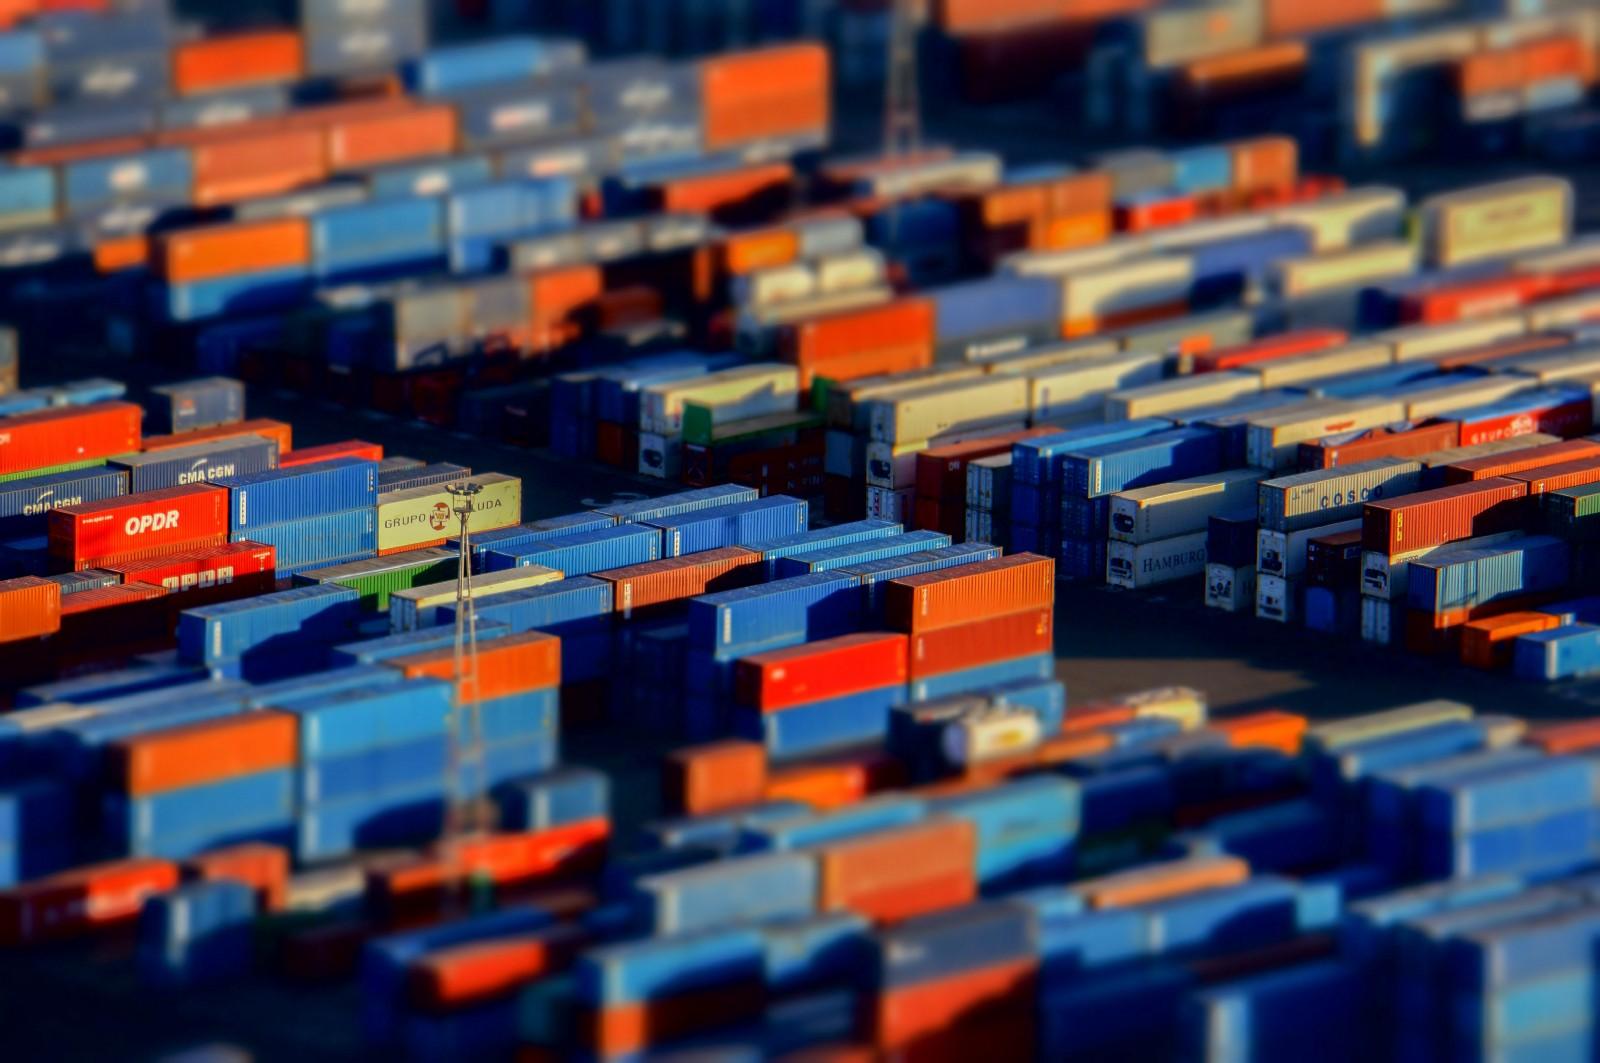 /build-a-crud-api-with-mongodb-express-and-docker-70510c6f706b feature image